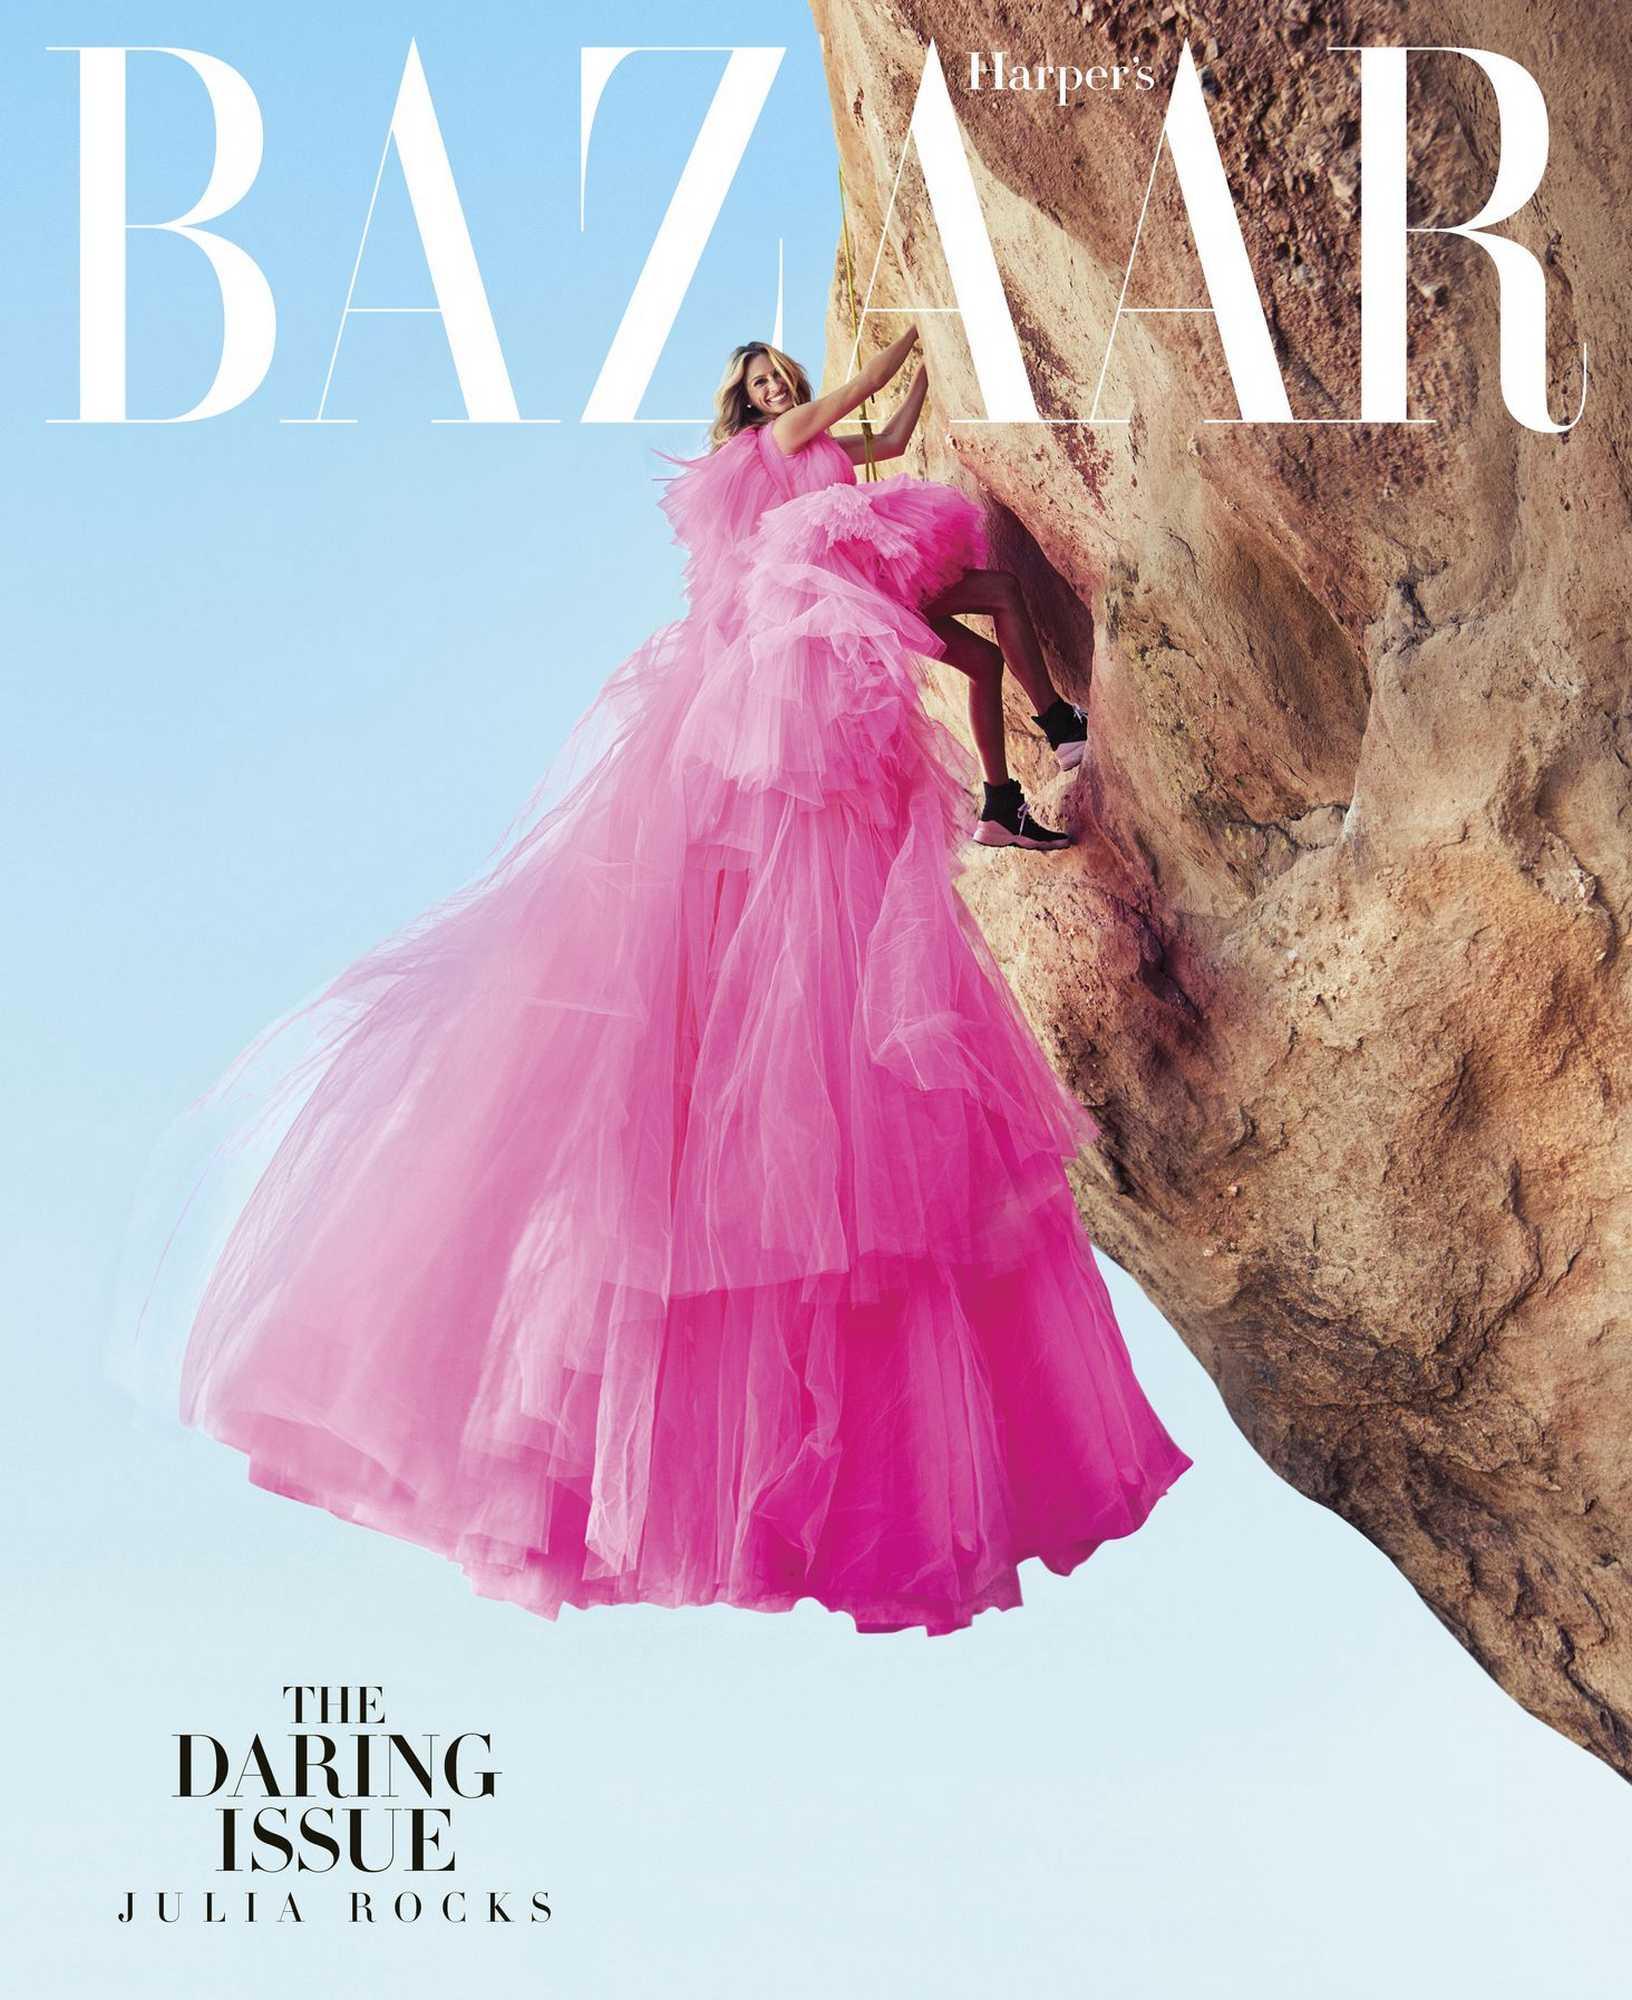 Julia-Roberts-US-Harpers-Bazaar-November-2018491da2998803974.jpg